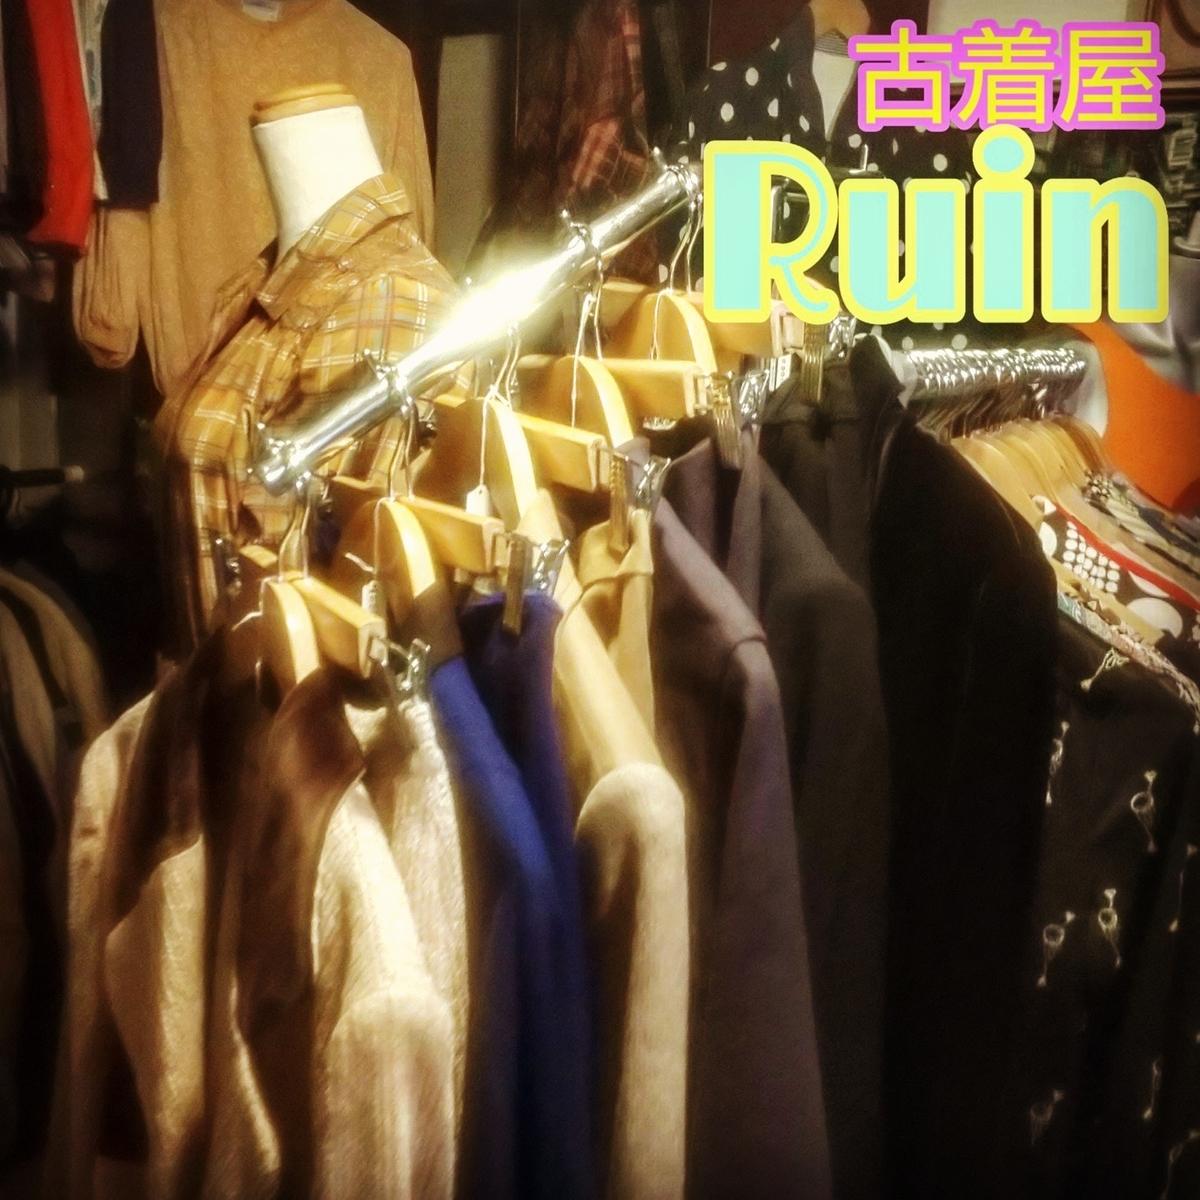 f:id:ruin-selectshop:20190904140925j:plain